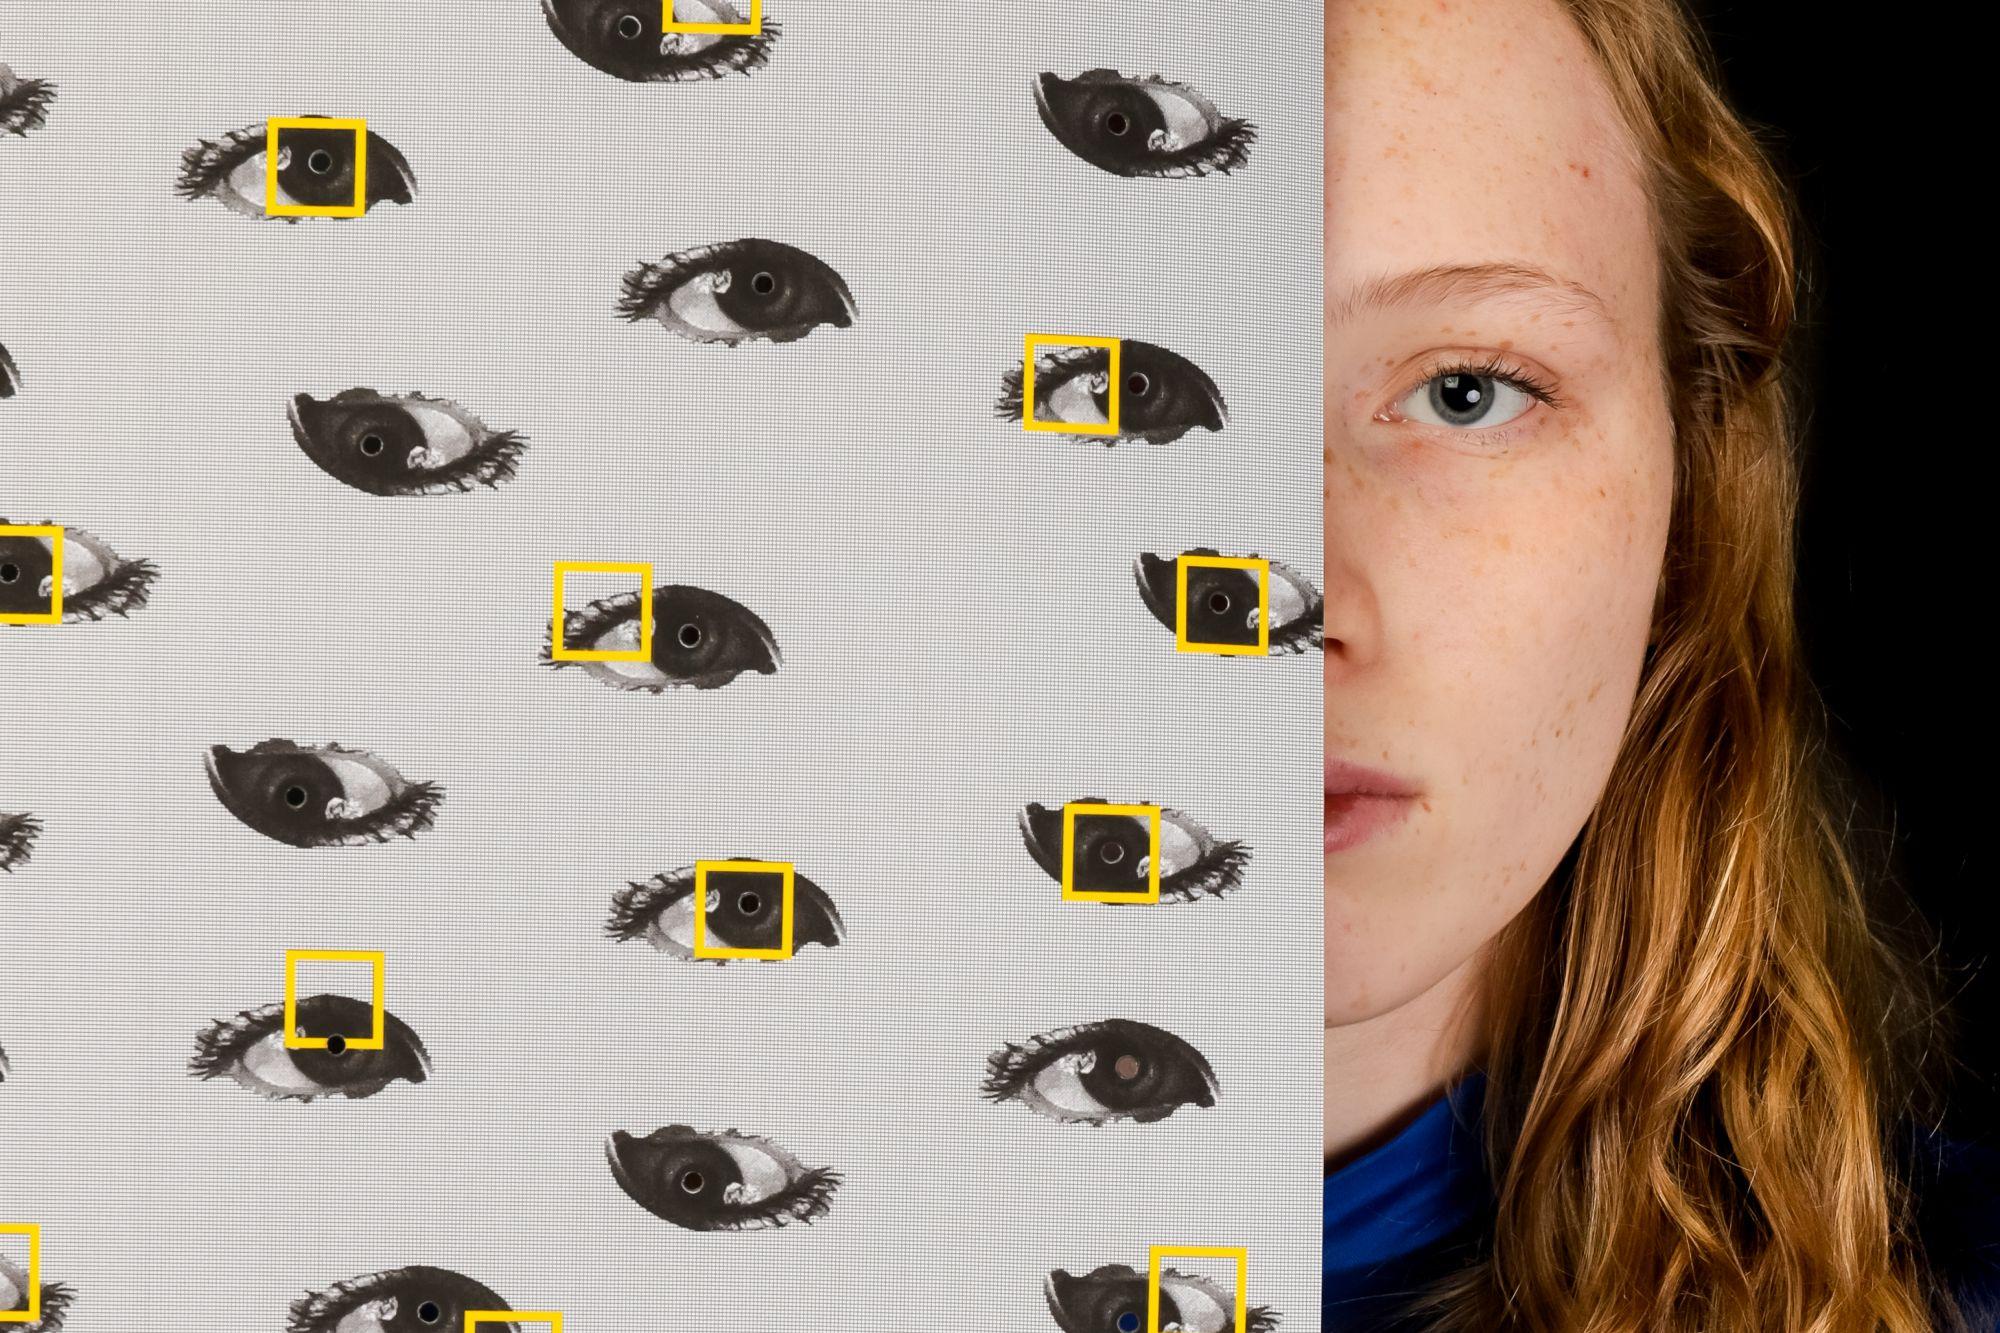 Emma Bervard / Paula Hornickel (Digitaldruck und Stanzung)